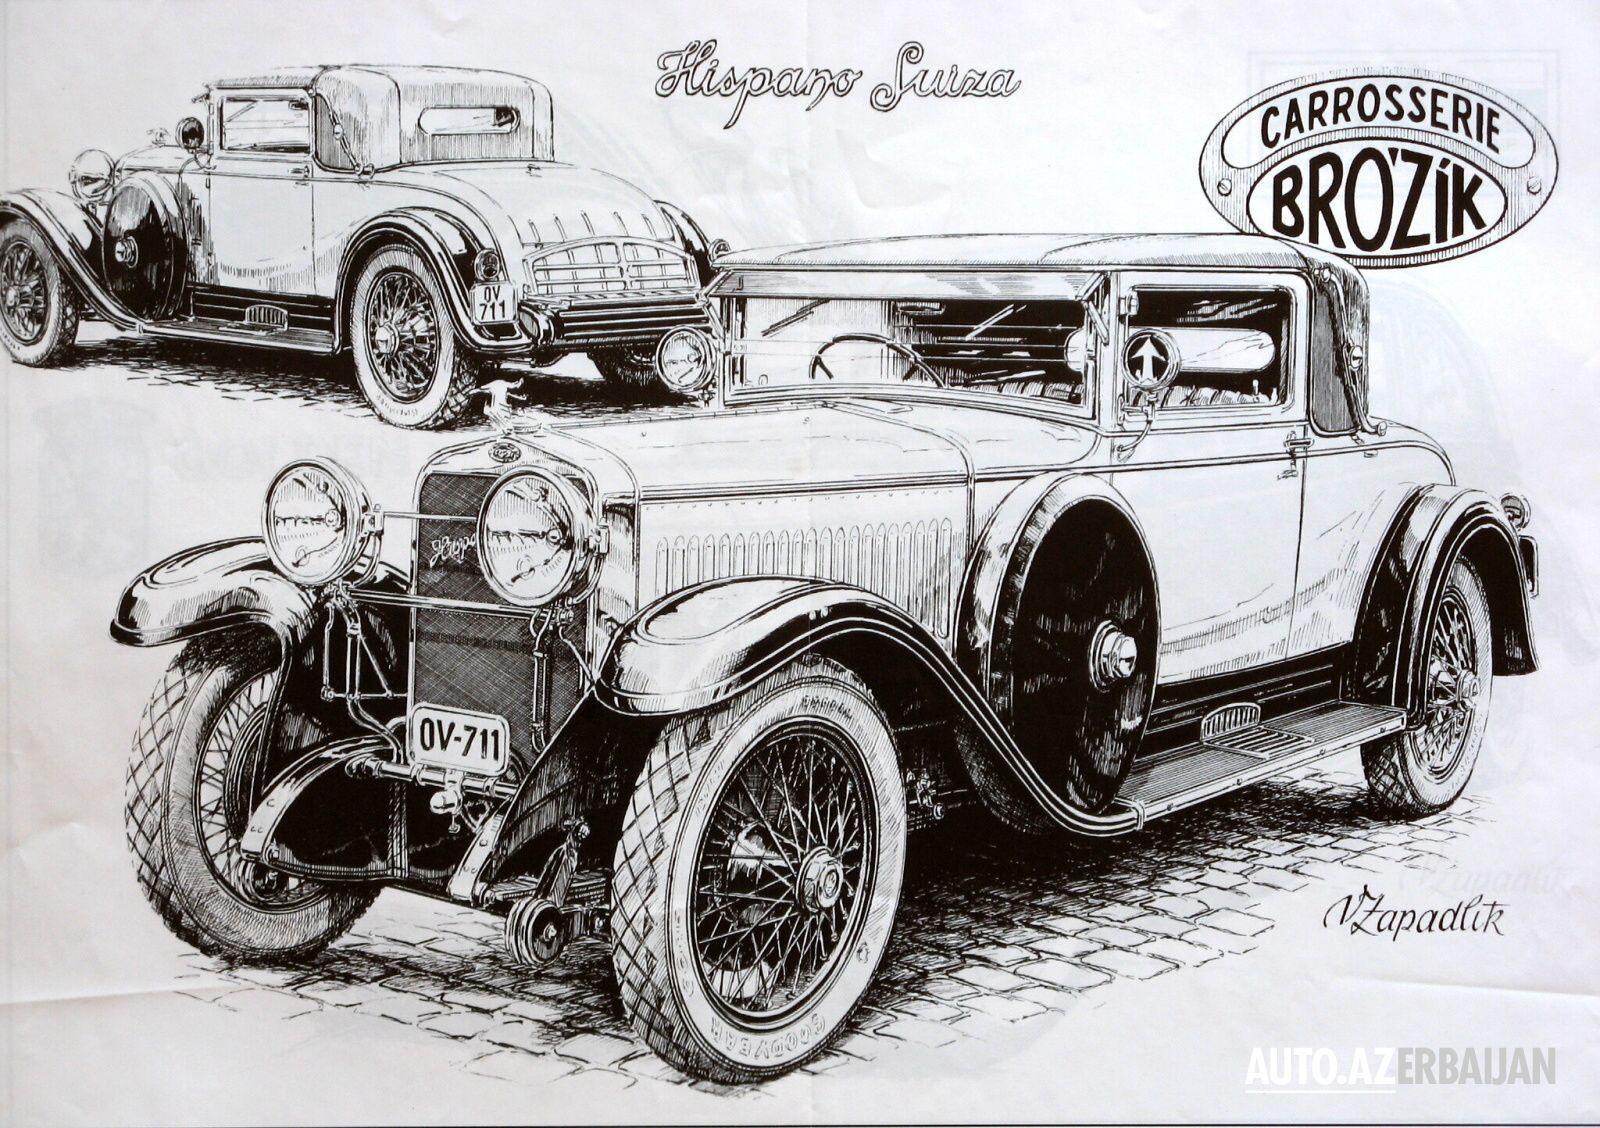 Hispano Suiza | My fav motors | Pinterest | Vehicle and Cars